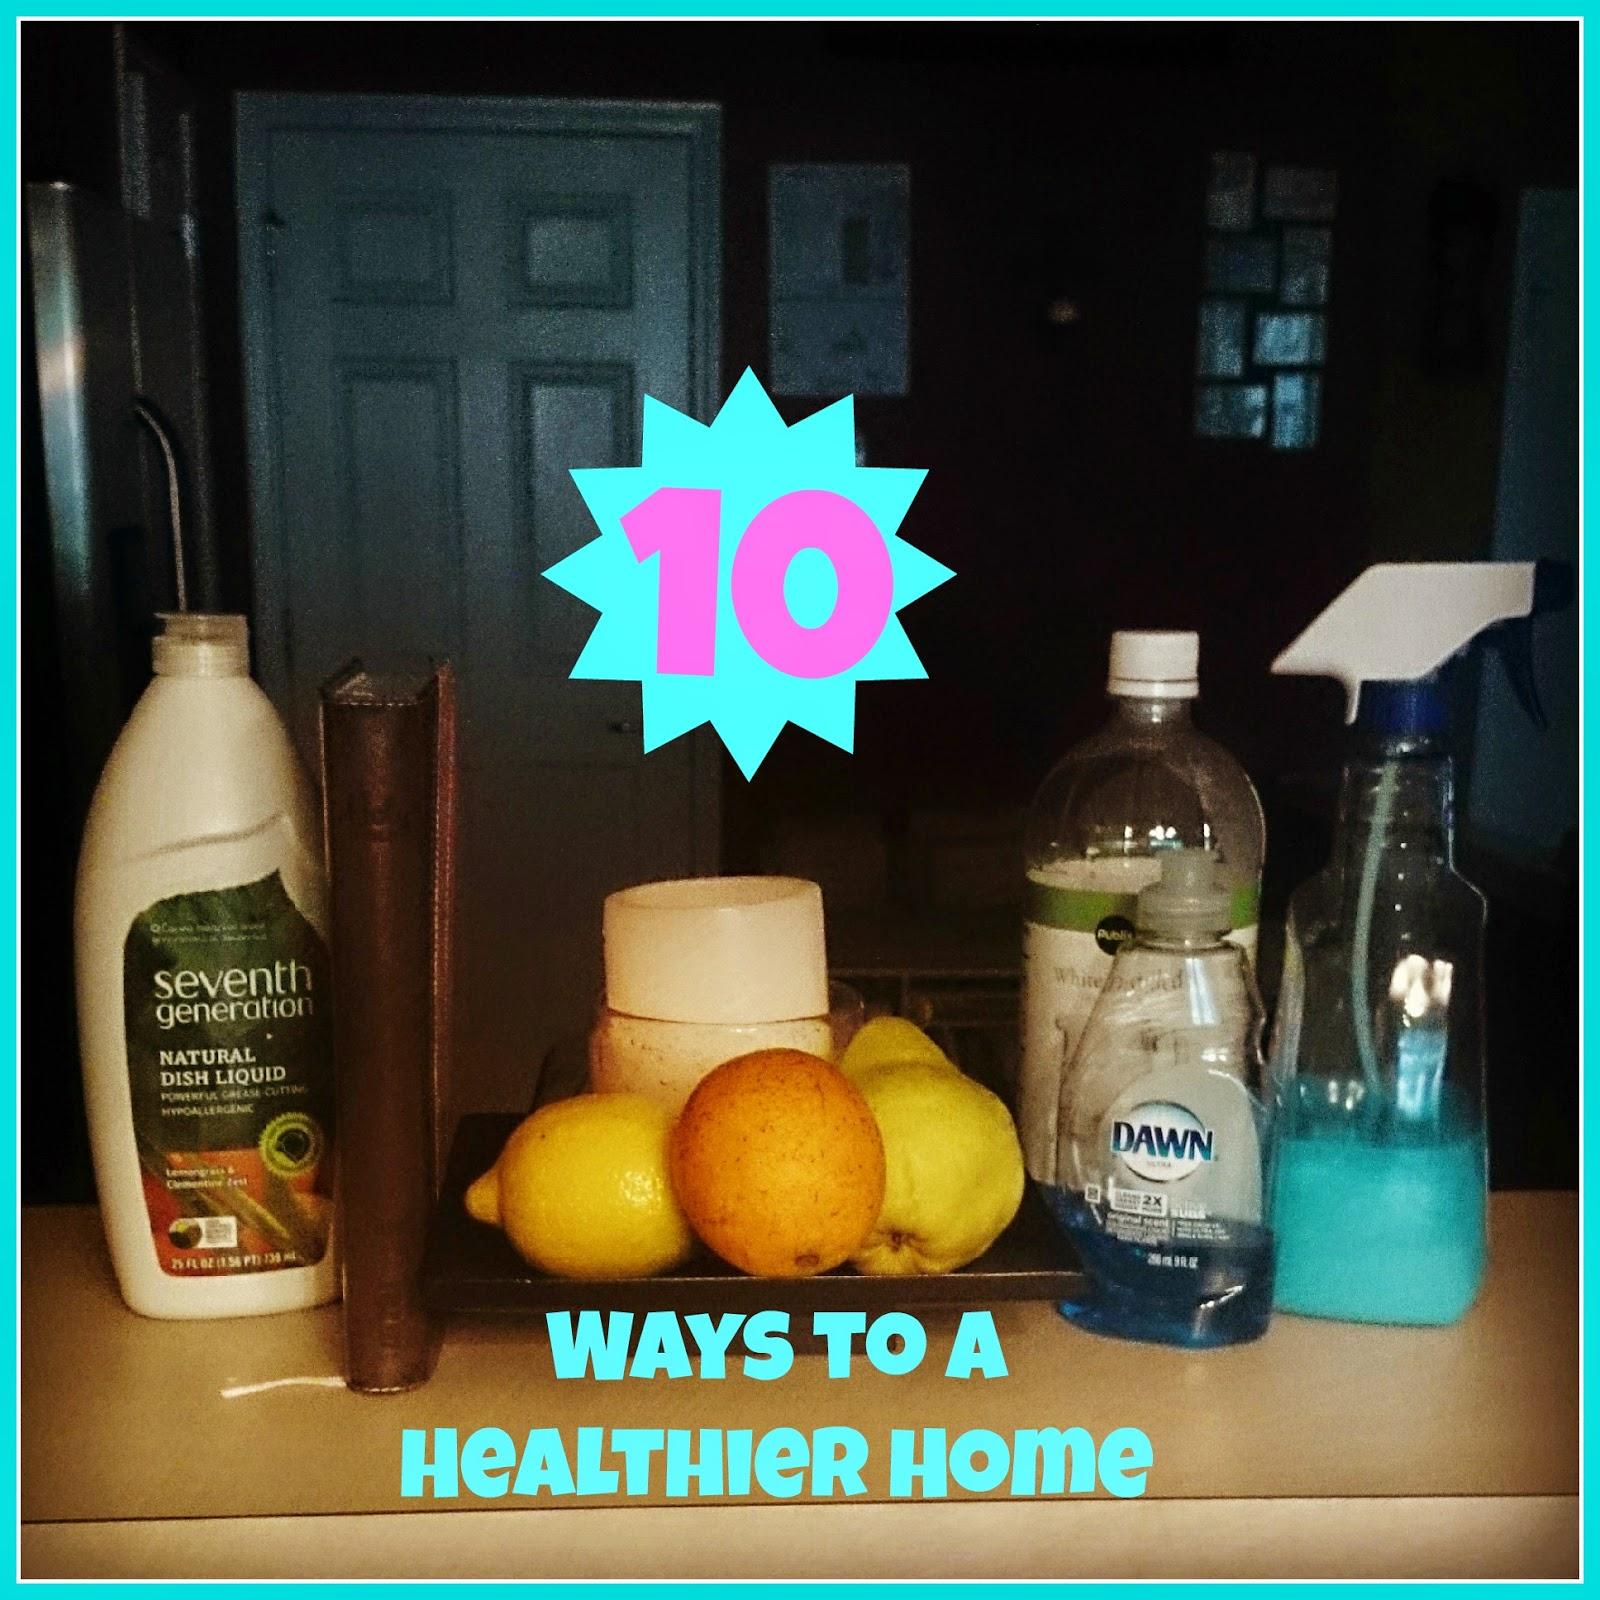 http://raisingsamuels.blogspot.com/2014/05/10-ways-to-healthier-home.html